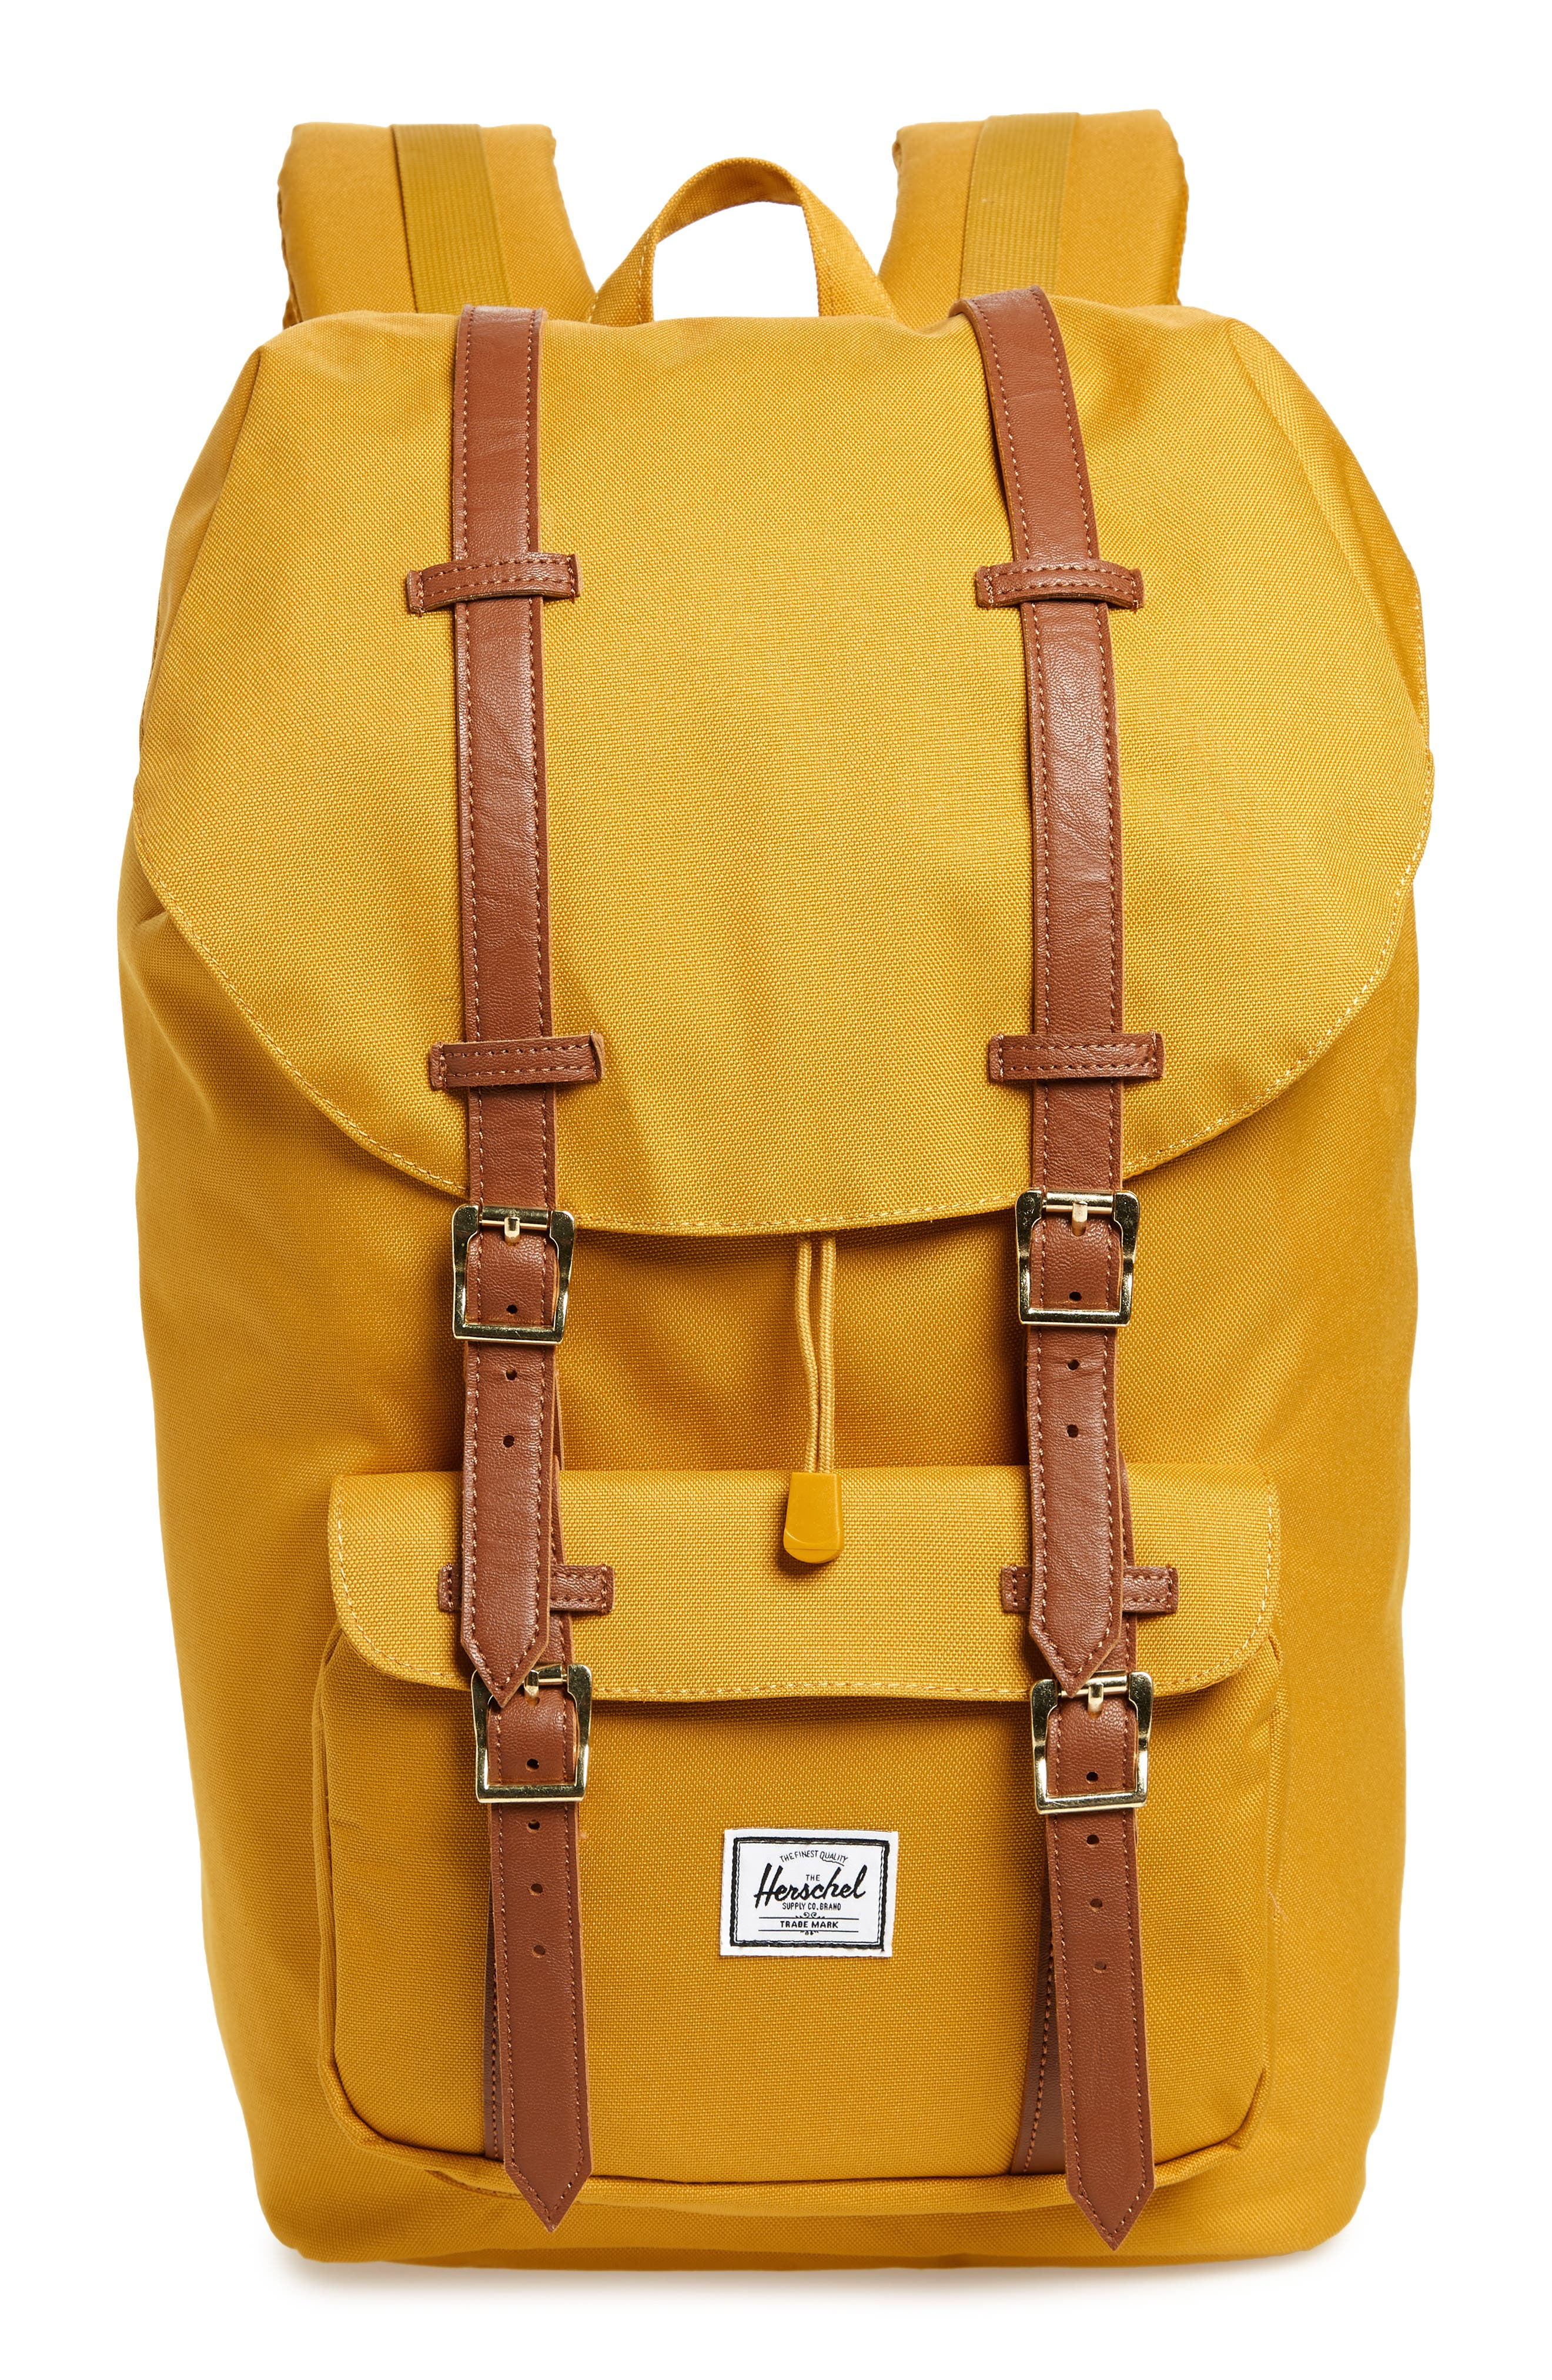 Little America Backpack,                             Main thumbnail 1, color,                             ARROW WOOD/ TAN LEATHER